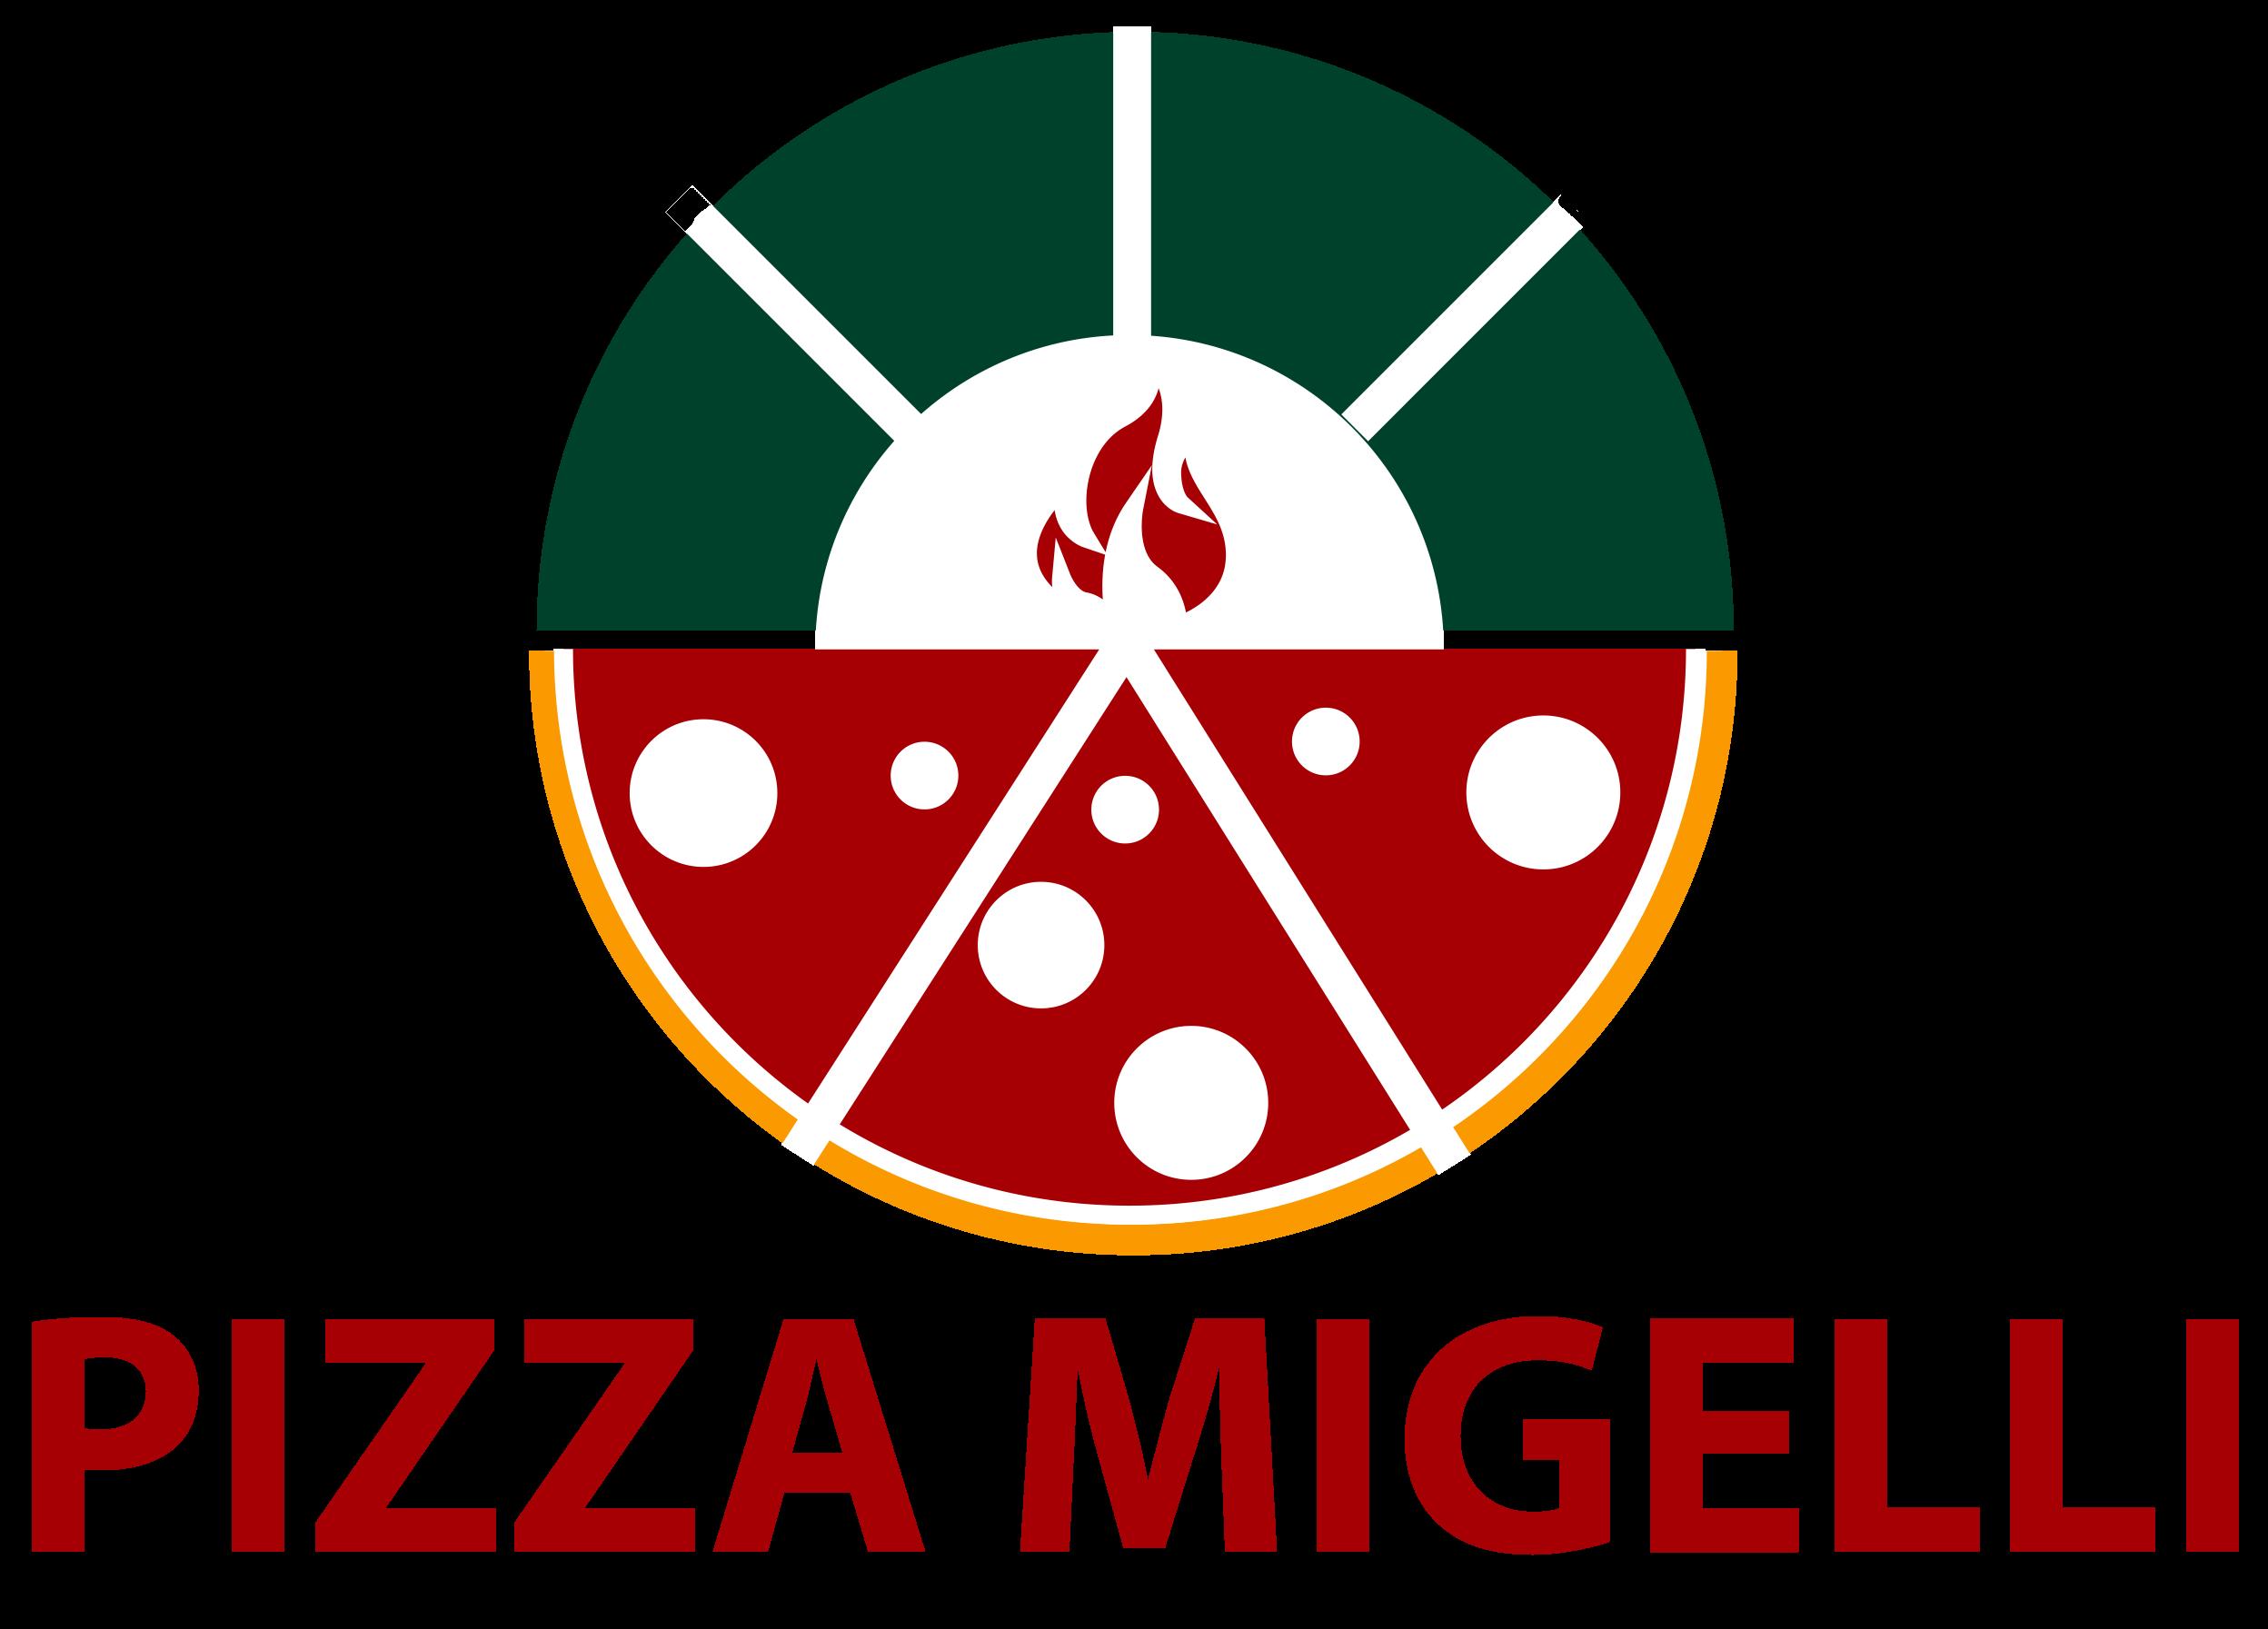 Pizza Migelli